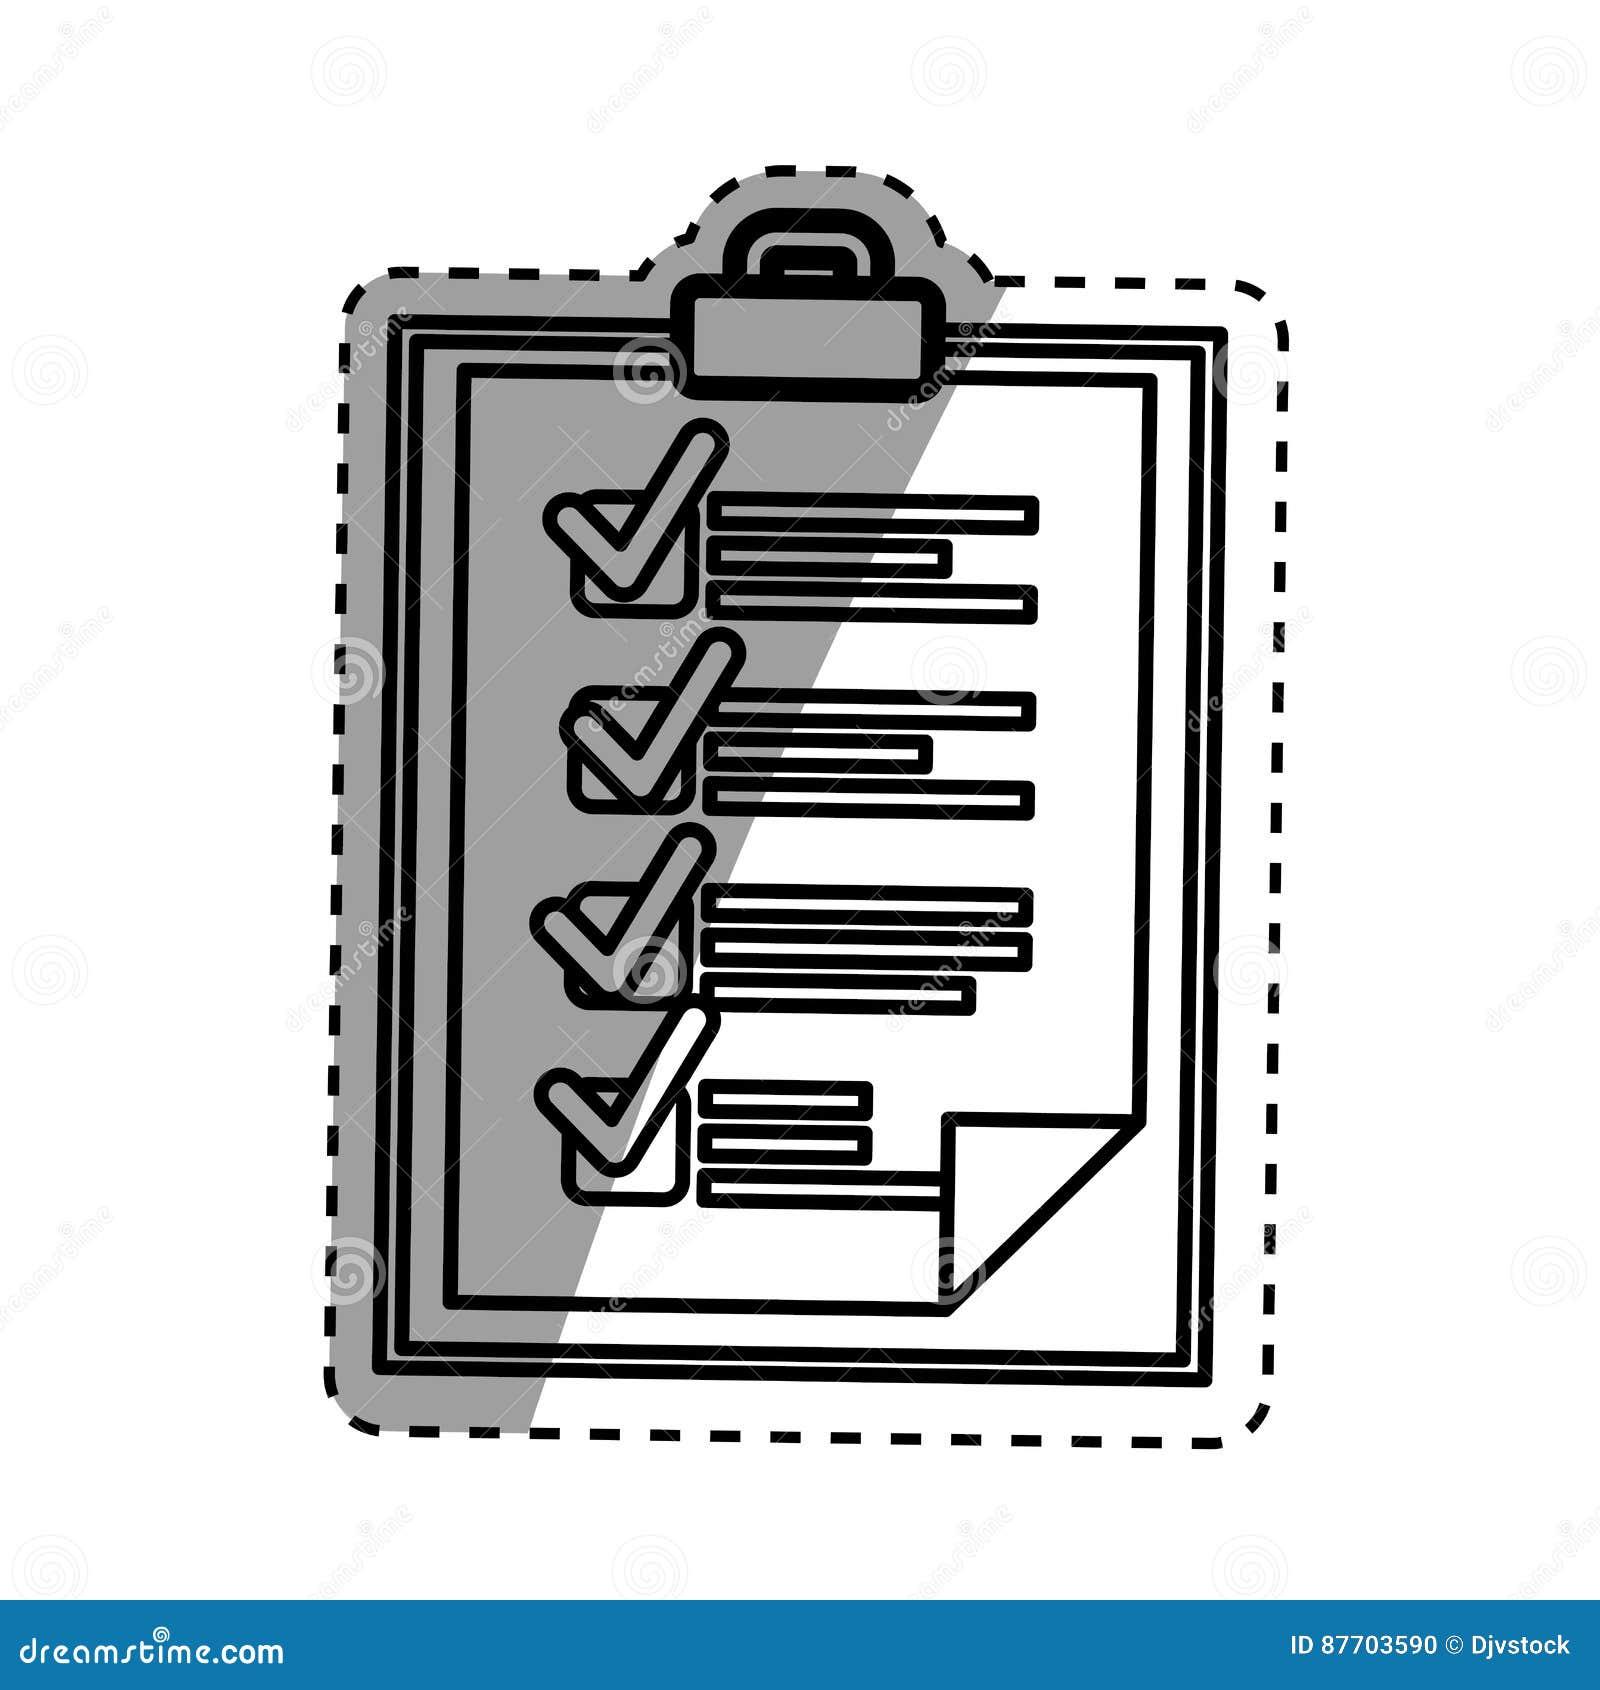 Symbole de forme de liste de contrôle